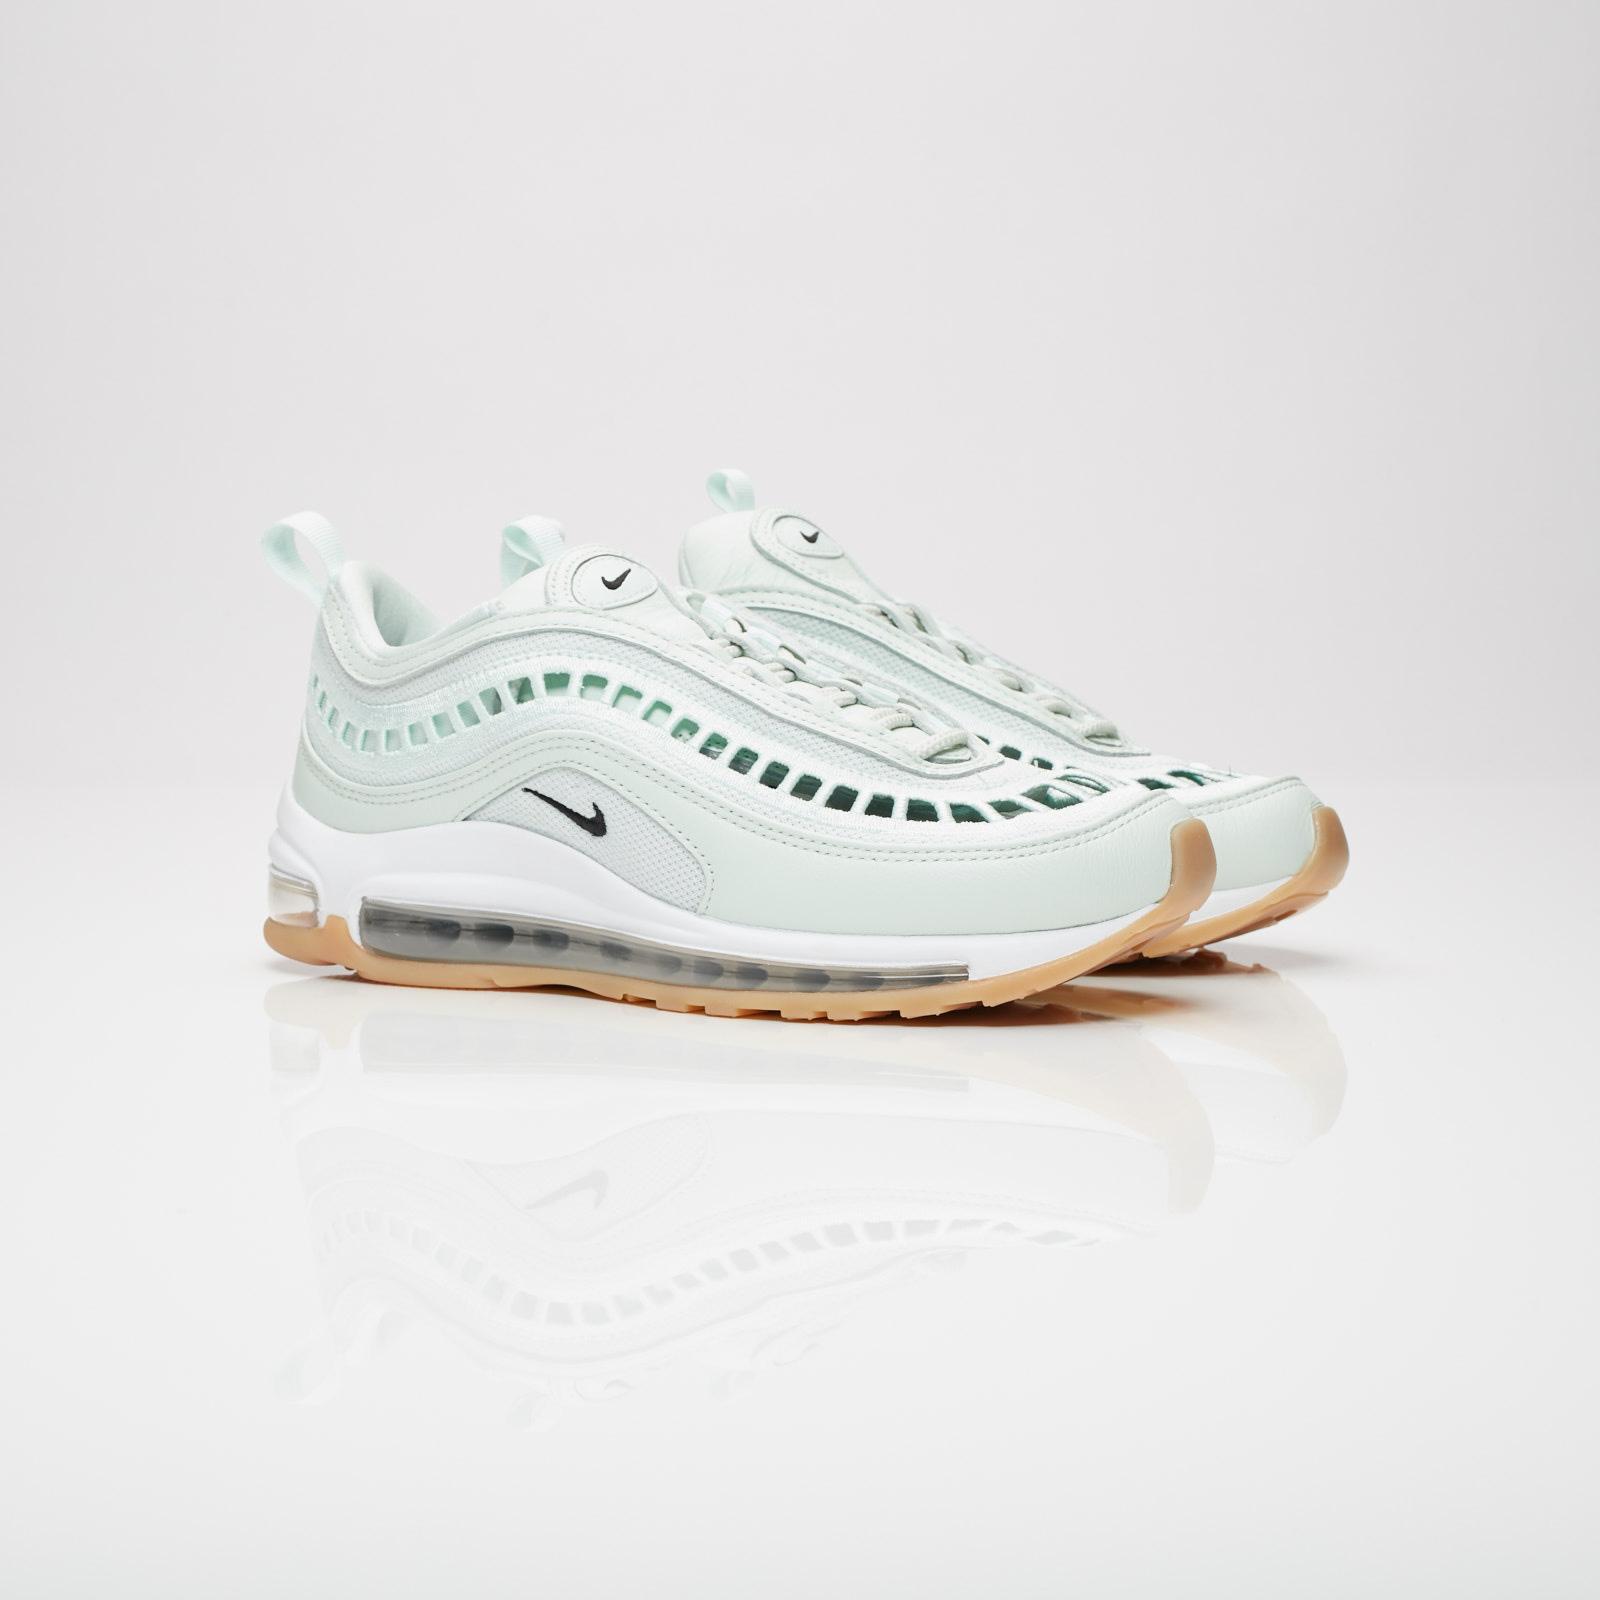 174ddaaee1 Nike Wmns Air Max 97 UL 17 SI - Ao2326-300 - Sneakersnstuff ...